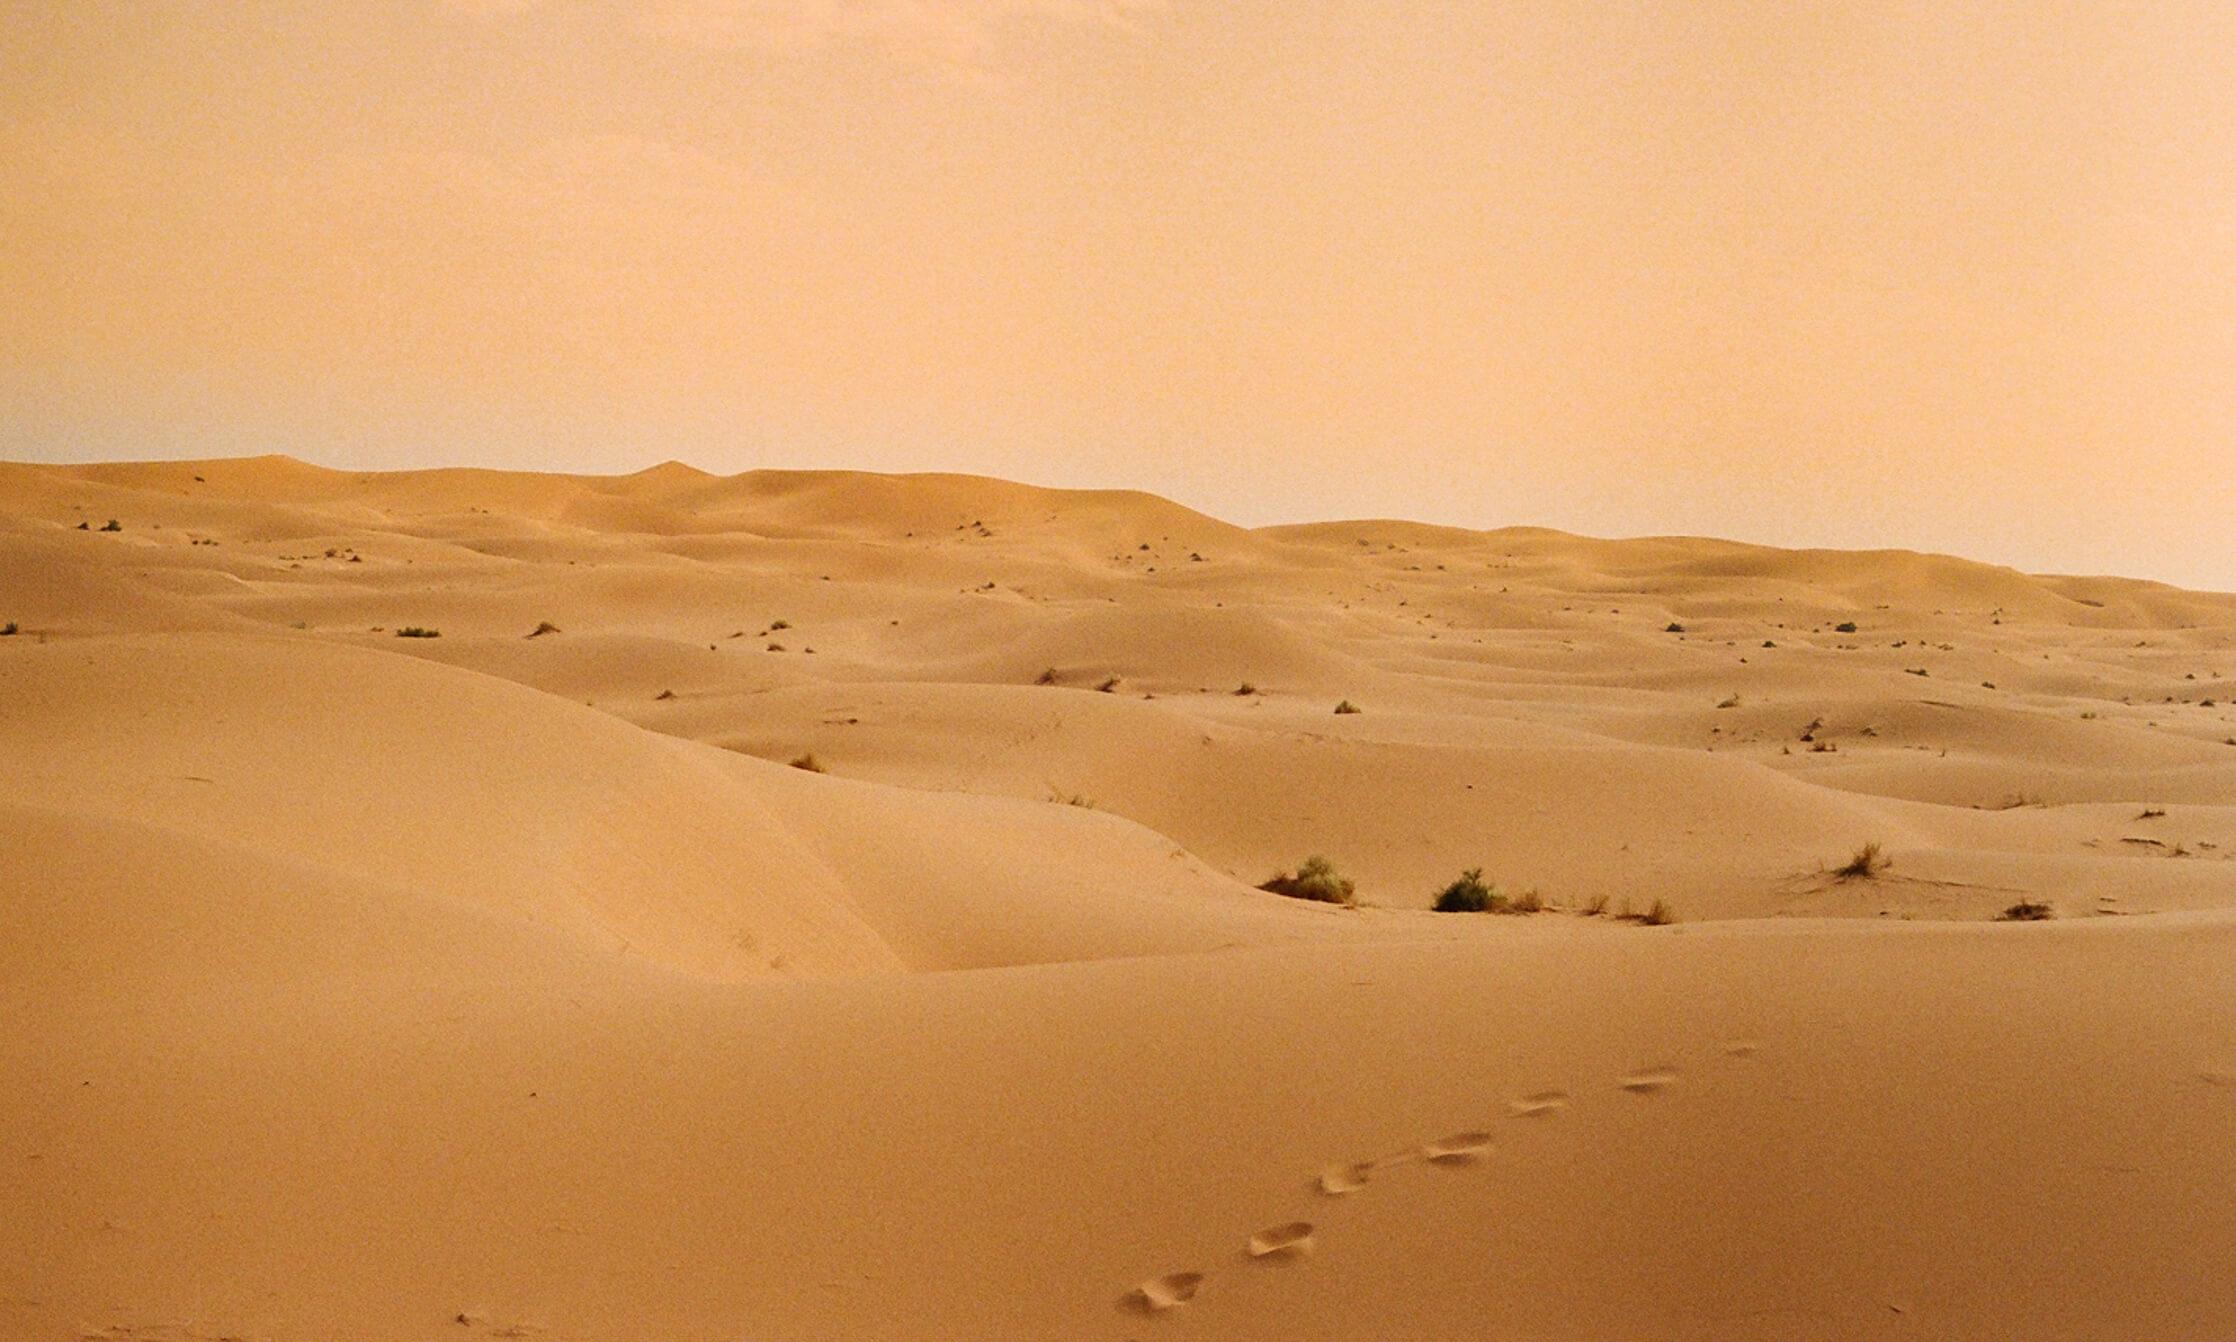 Beyond the Treeless Sand-Brown Hills